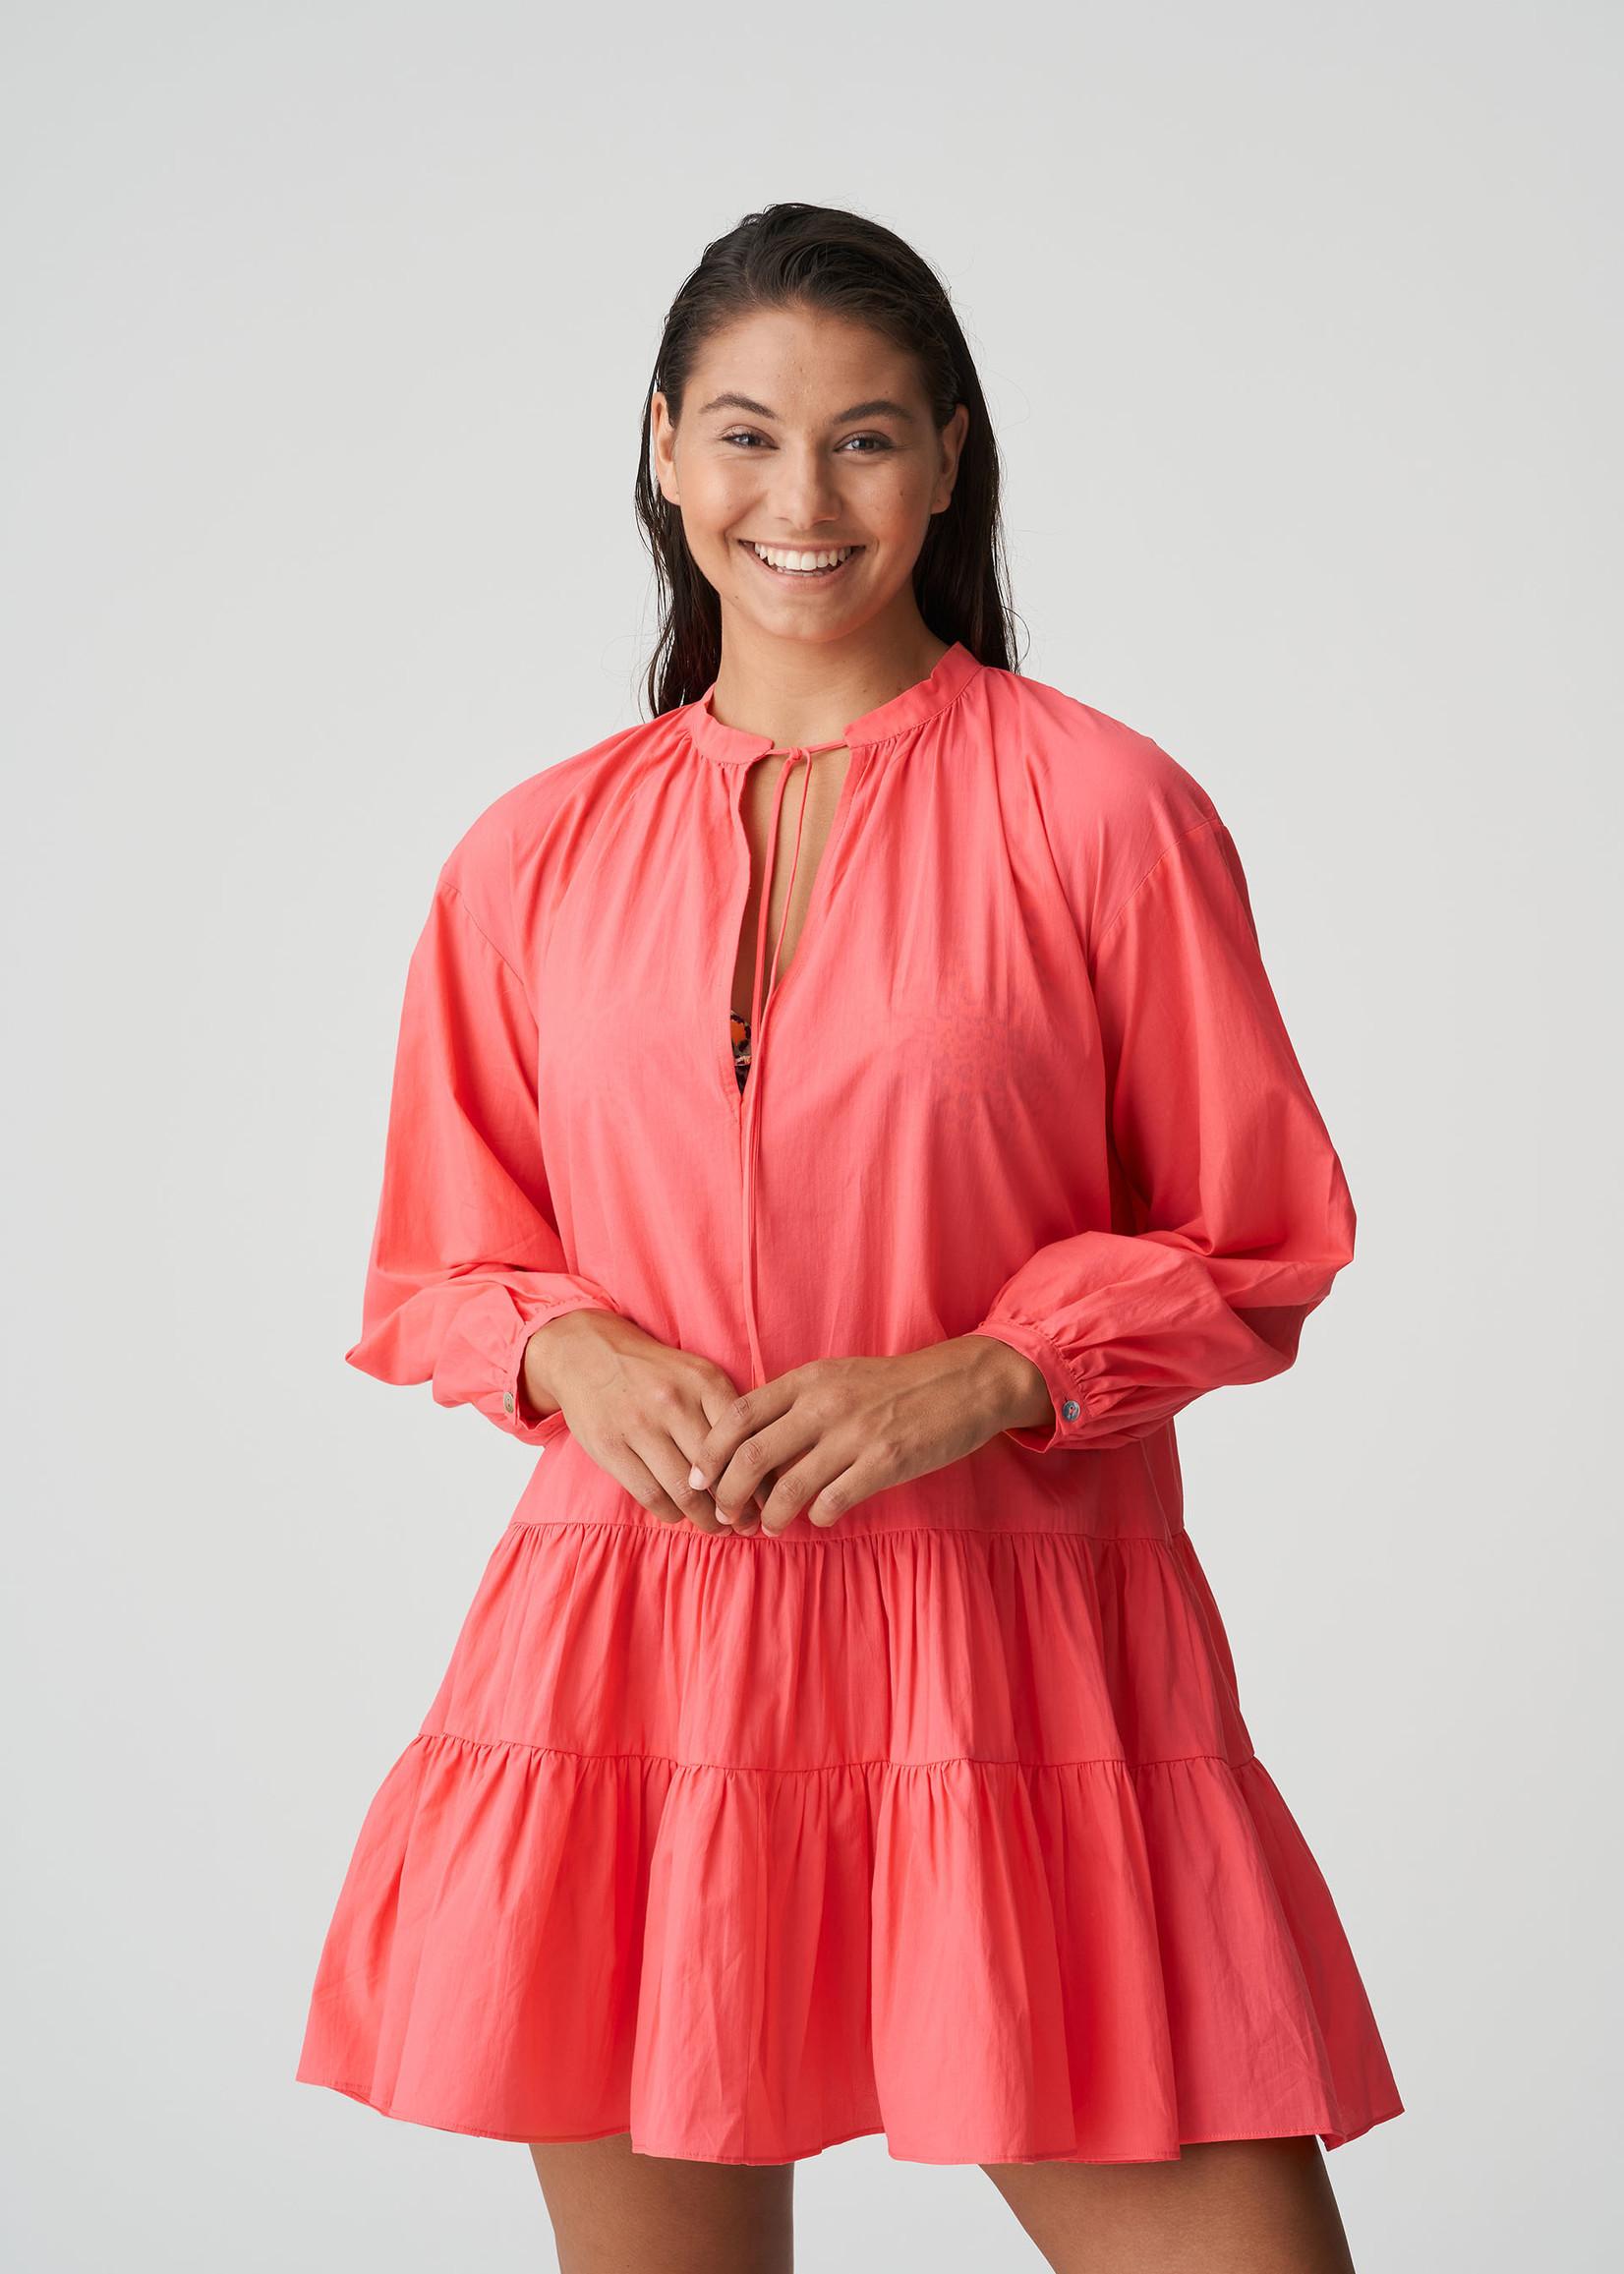 Prima Donna Managua Dress